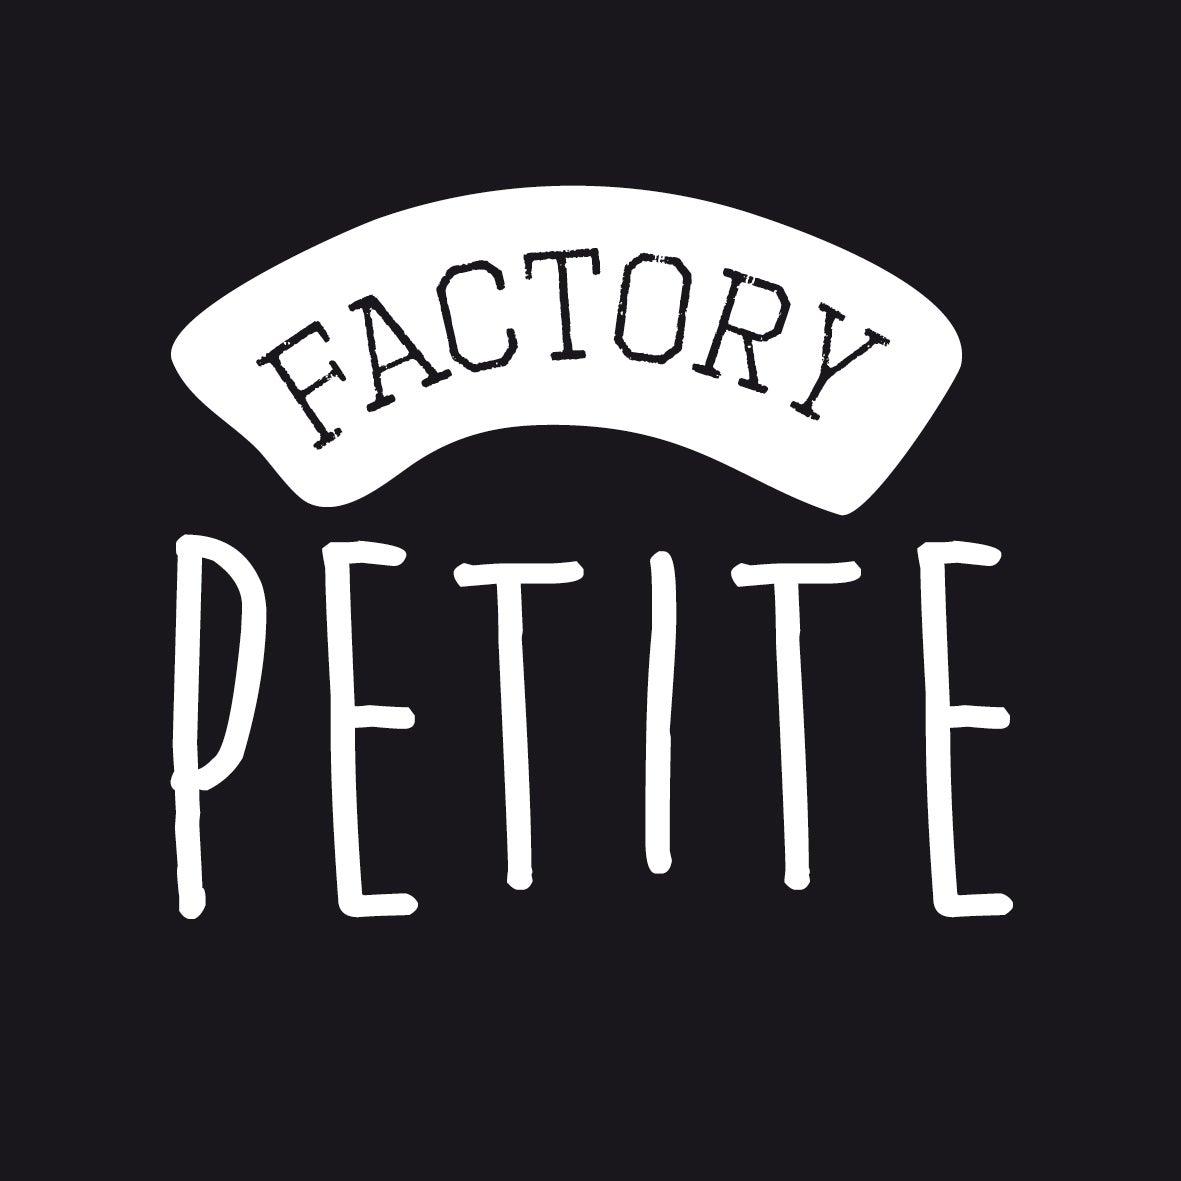 Factory Petite